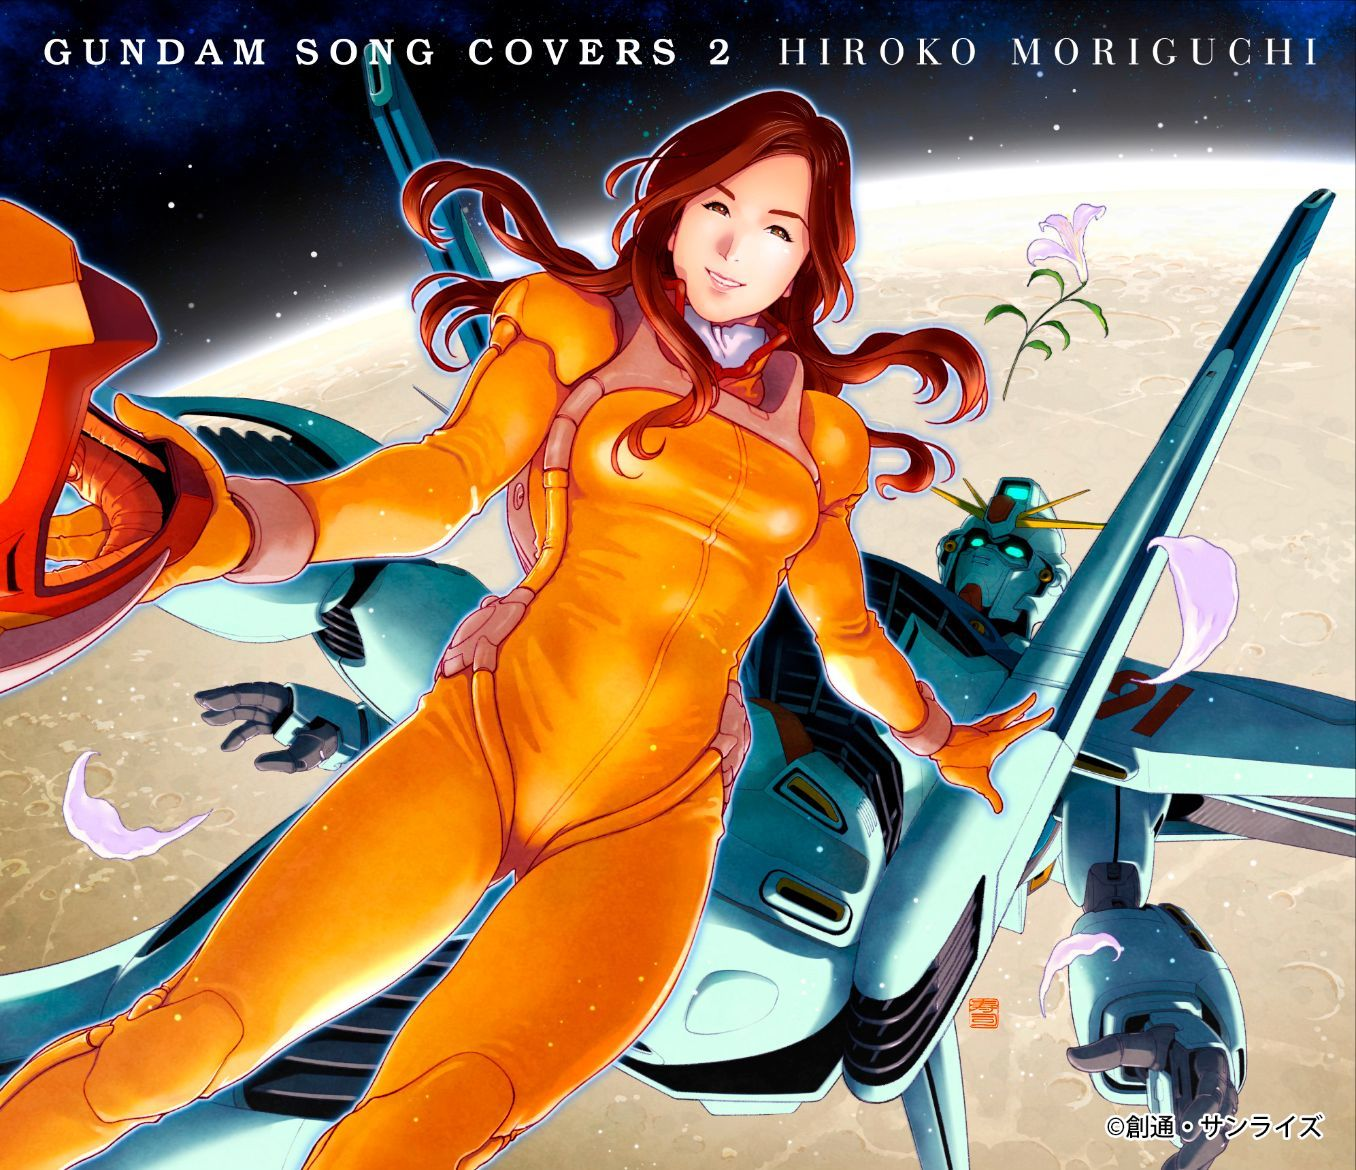 『GUNDAM SONG COVERS 2』通常盤